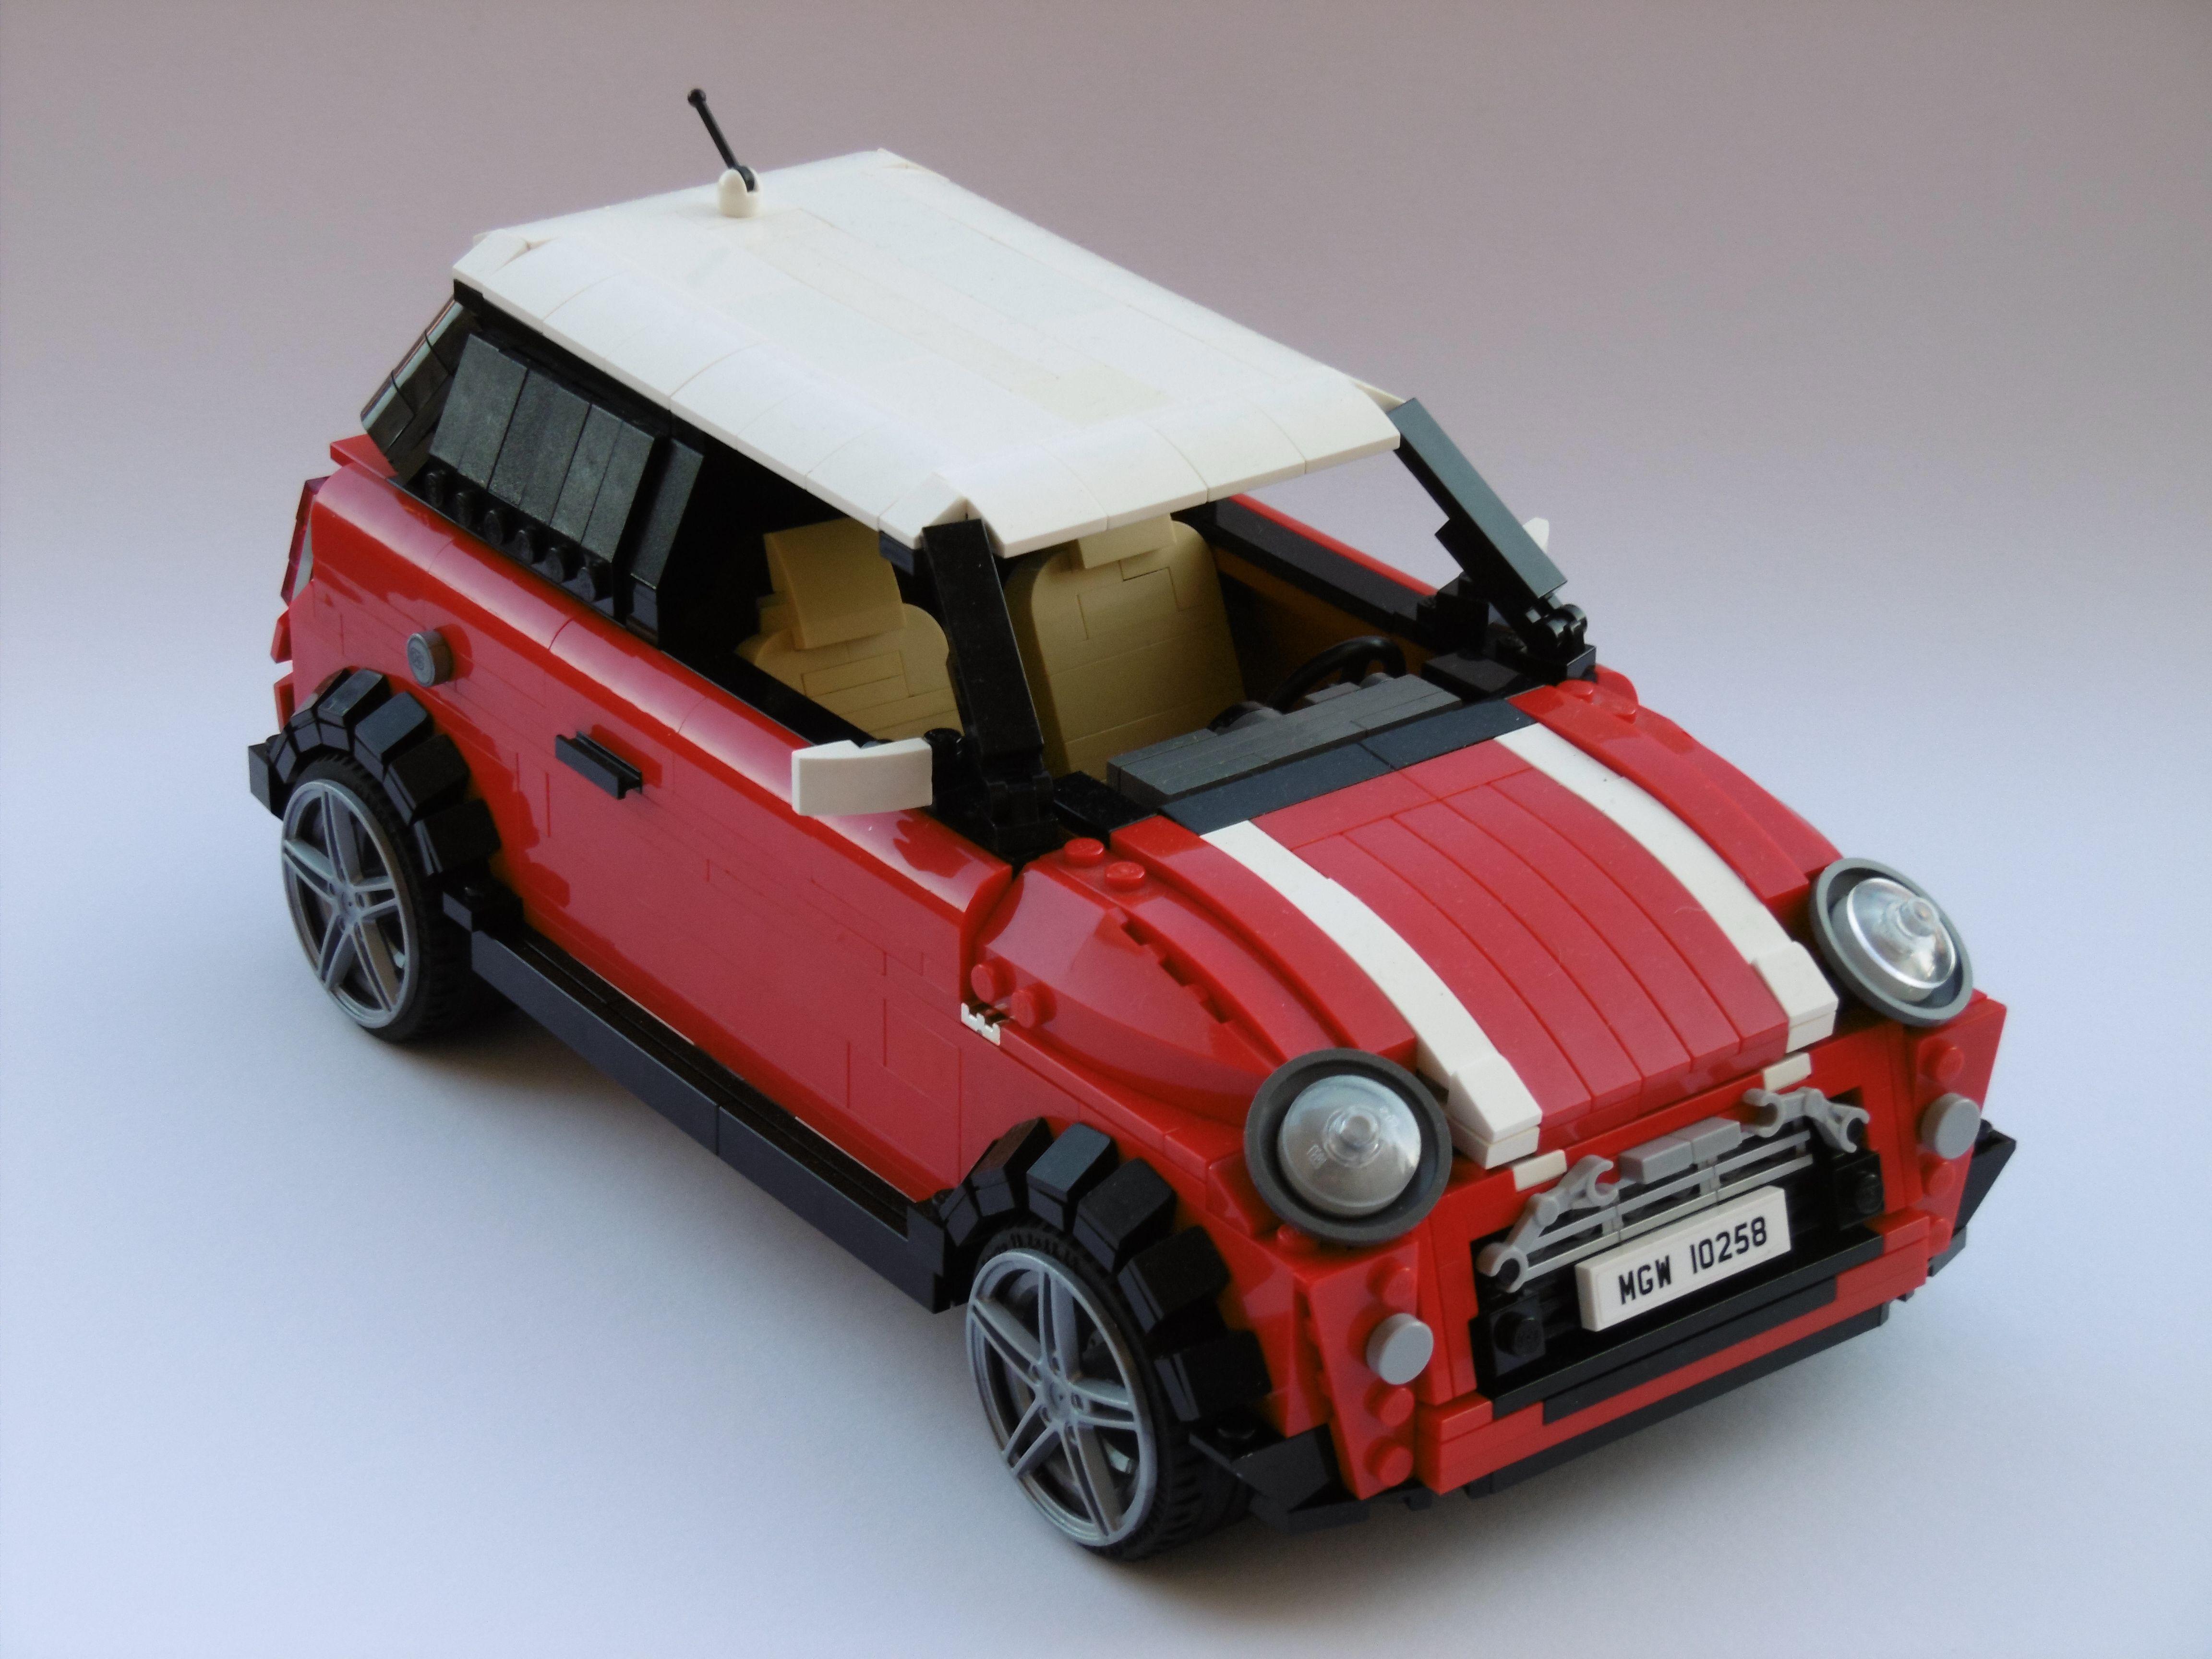 Lego Mini Cooper Lego Vintage Lego Creations Lego Lego